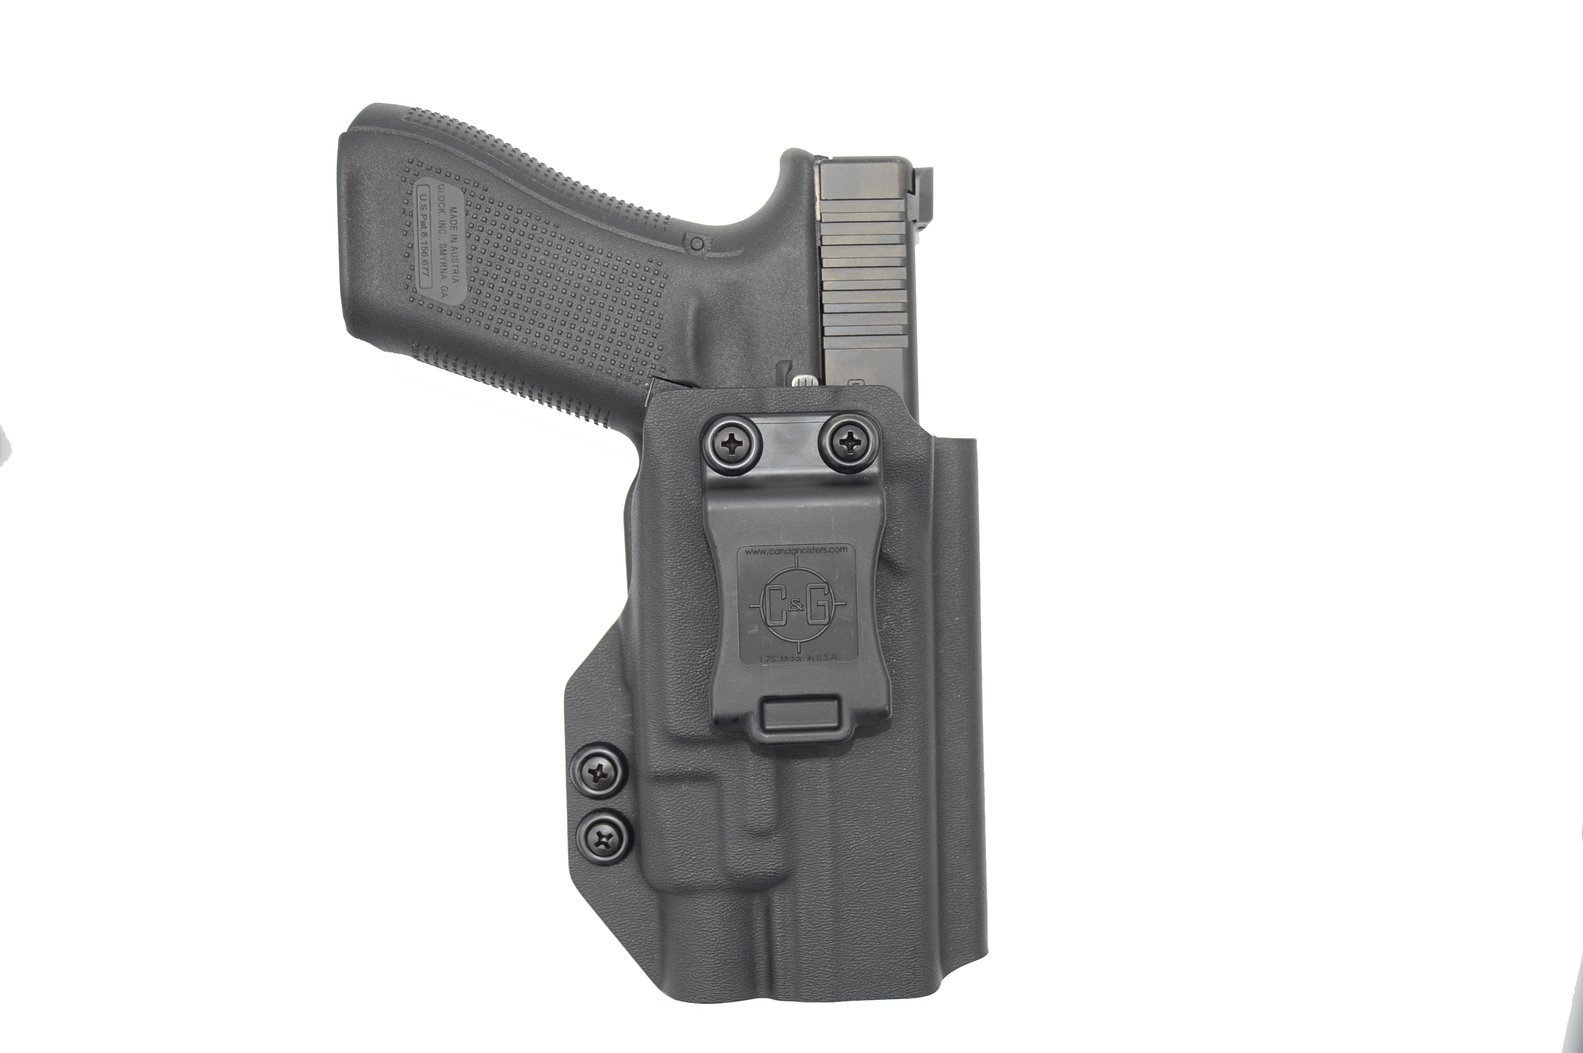 C&G Glock 17-22 TLR7 IWB Covert Kydex Holster - Quickship